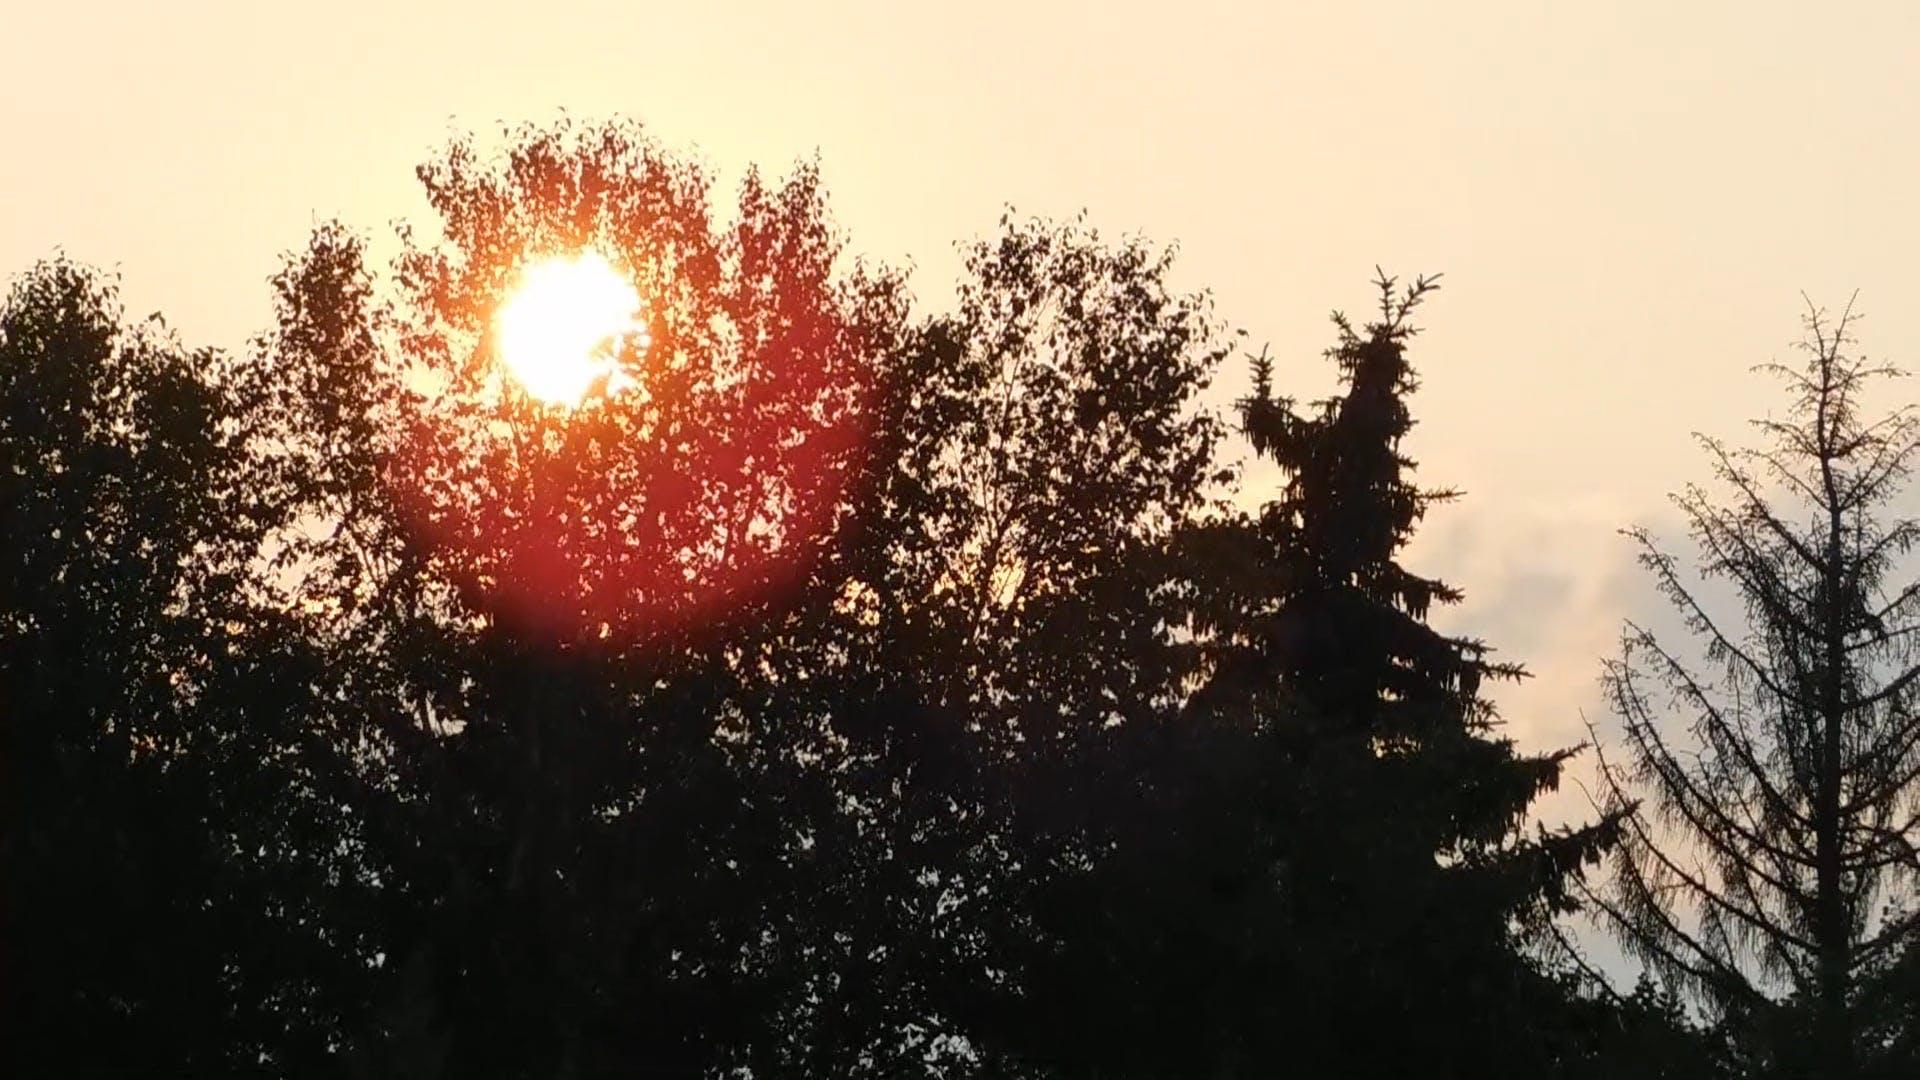 Video Of Sunset